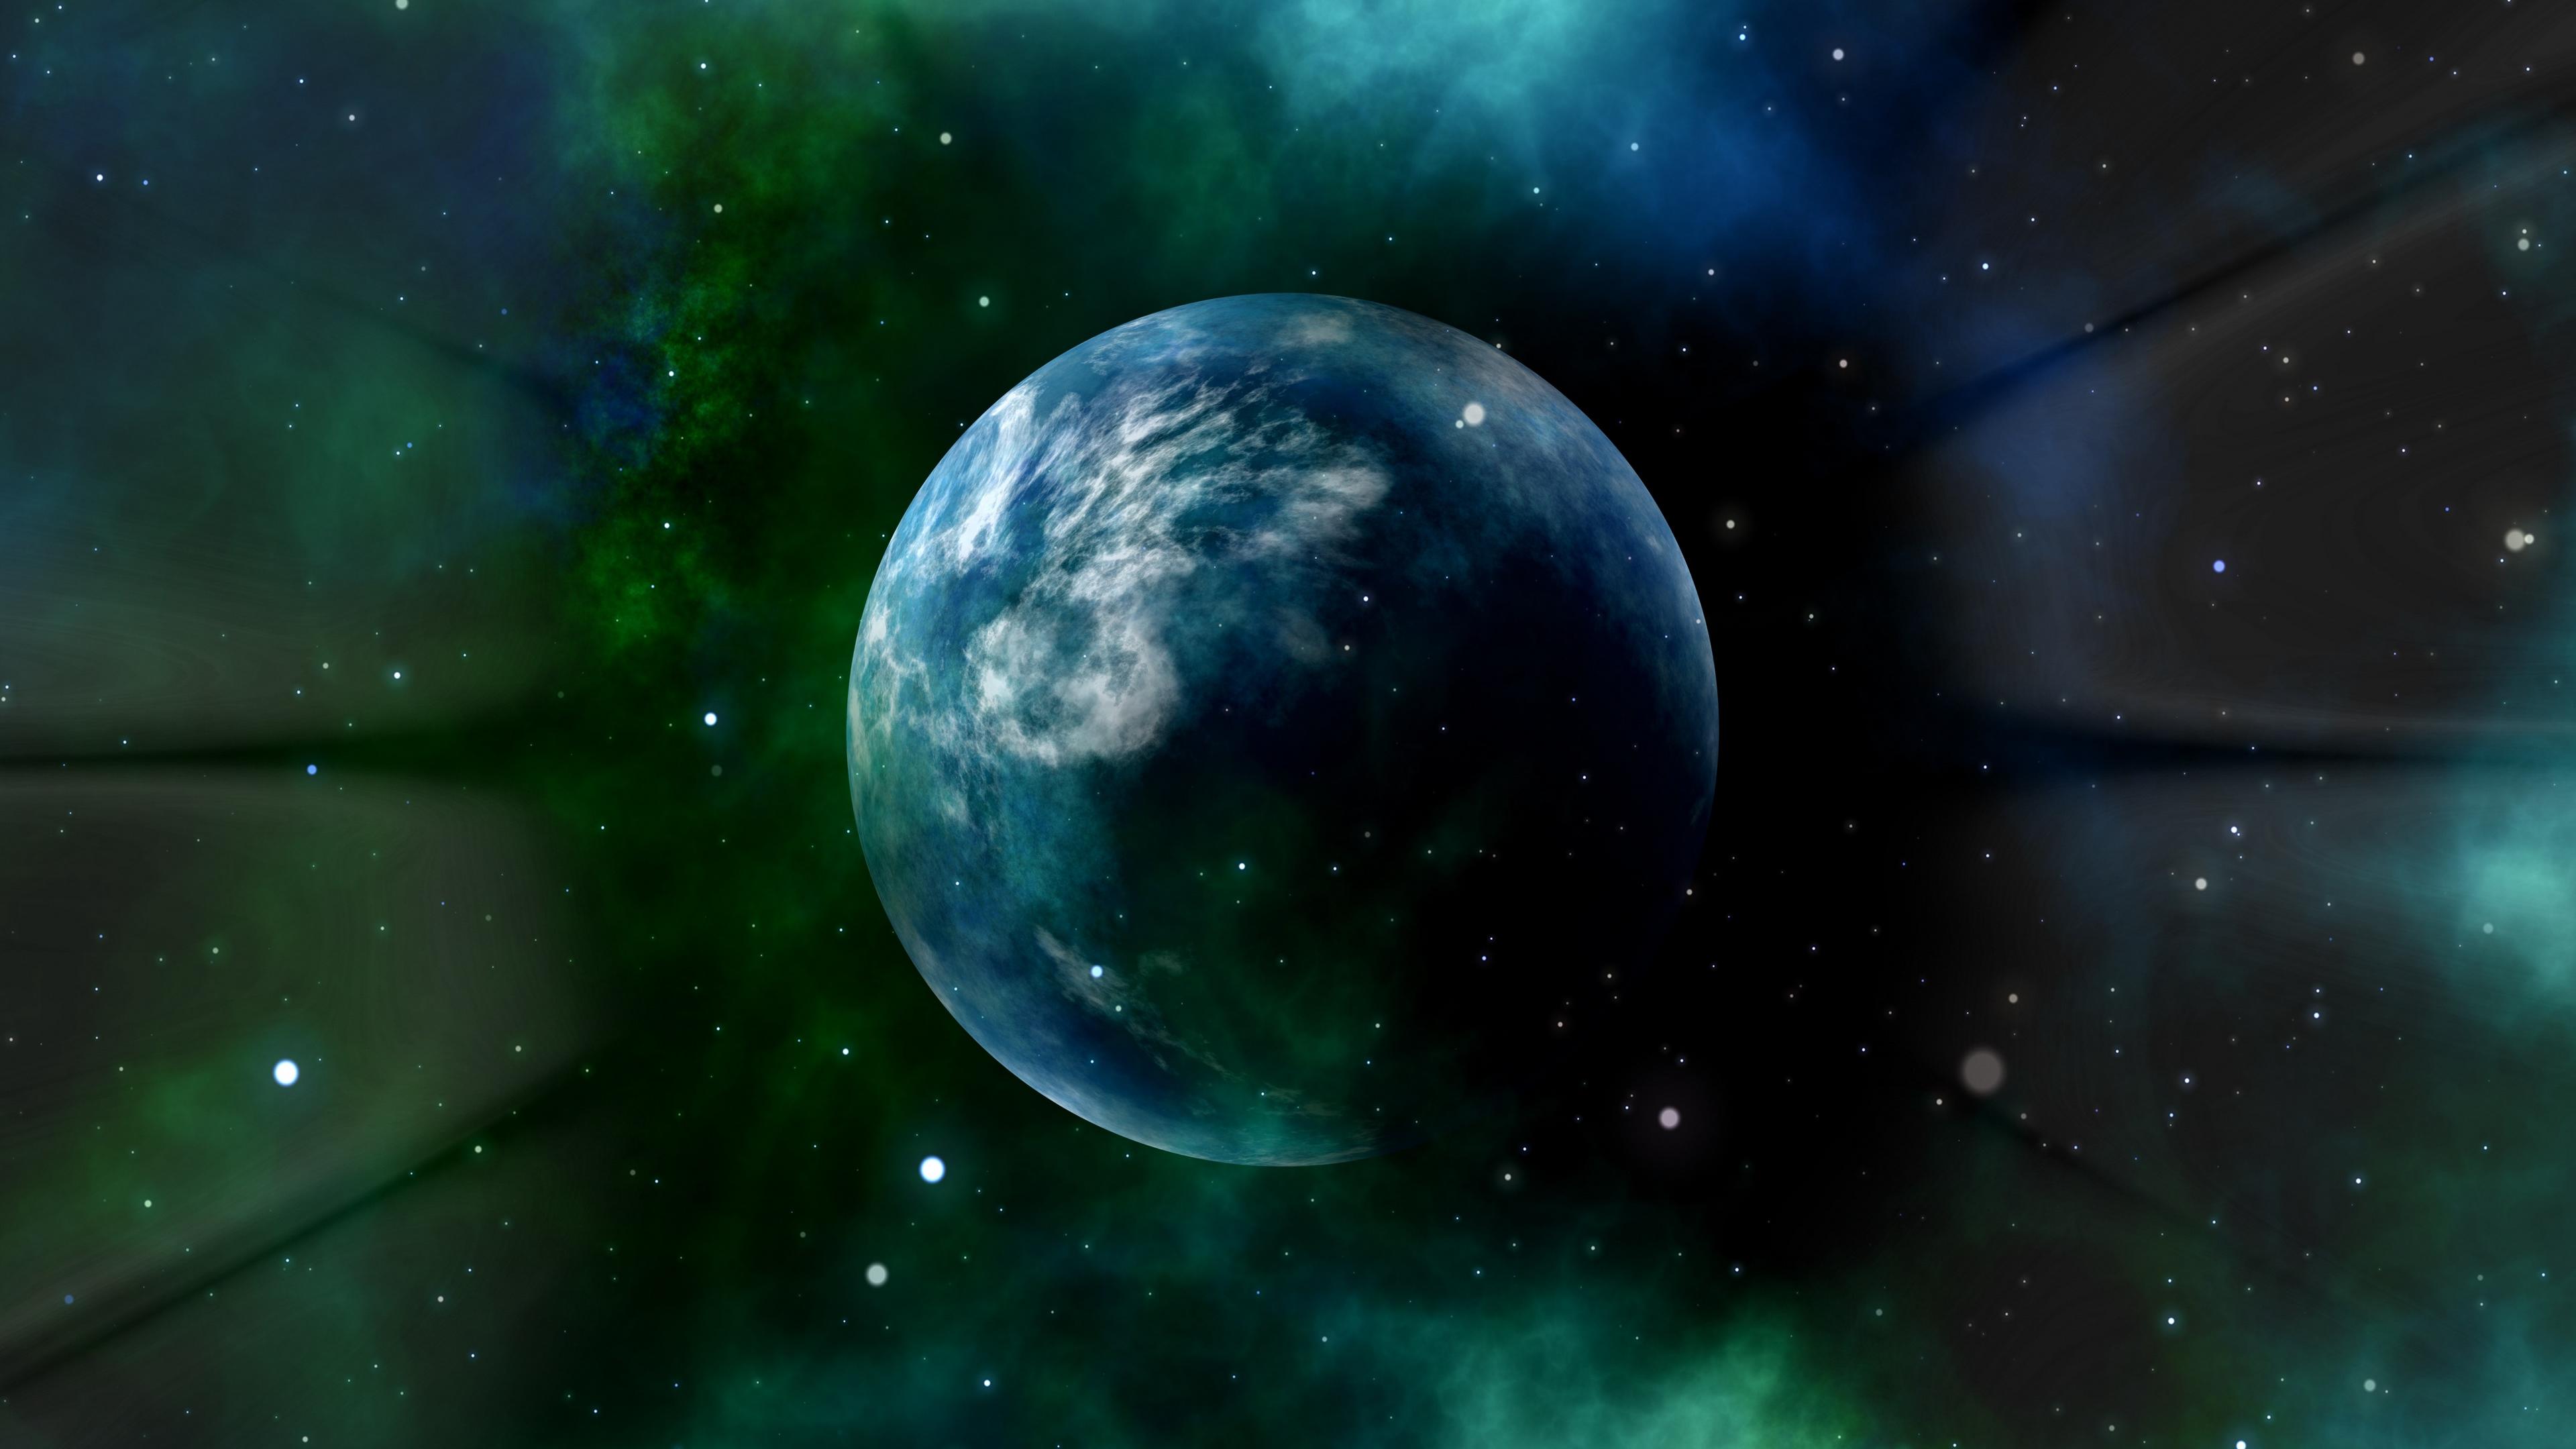 planet universe stars galaxy space 4k 1536013863 - planet, universe, stars, galaxy, space 4k - Universe, Stars, Planet